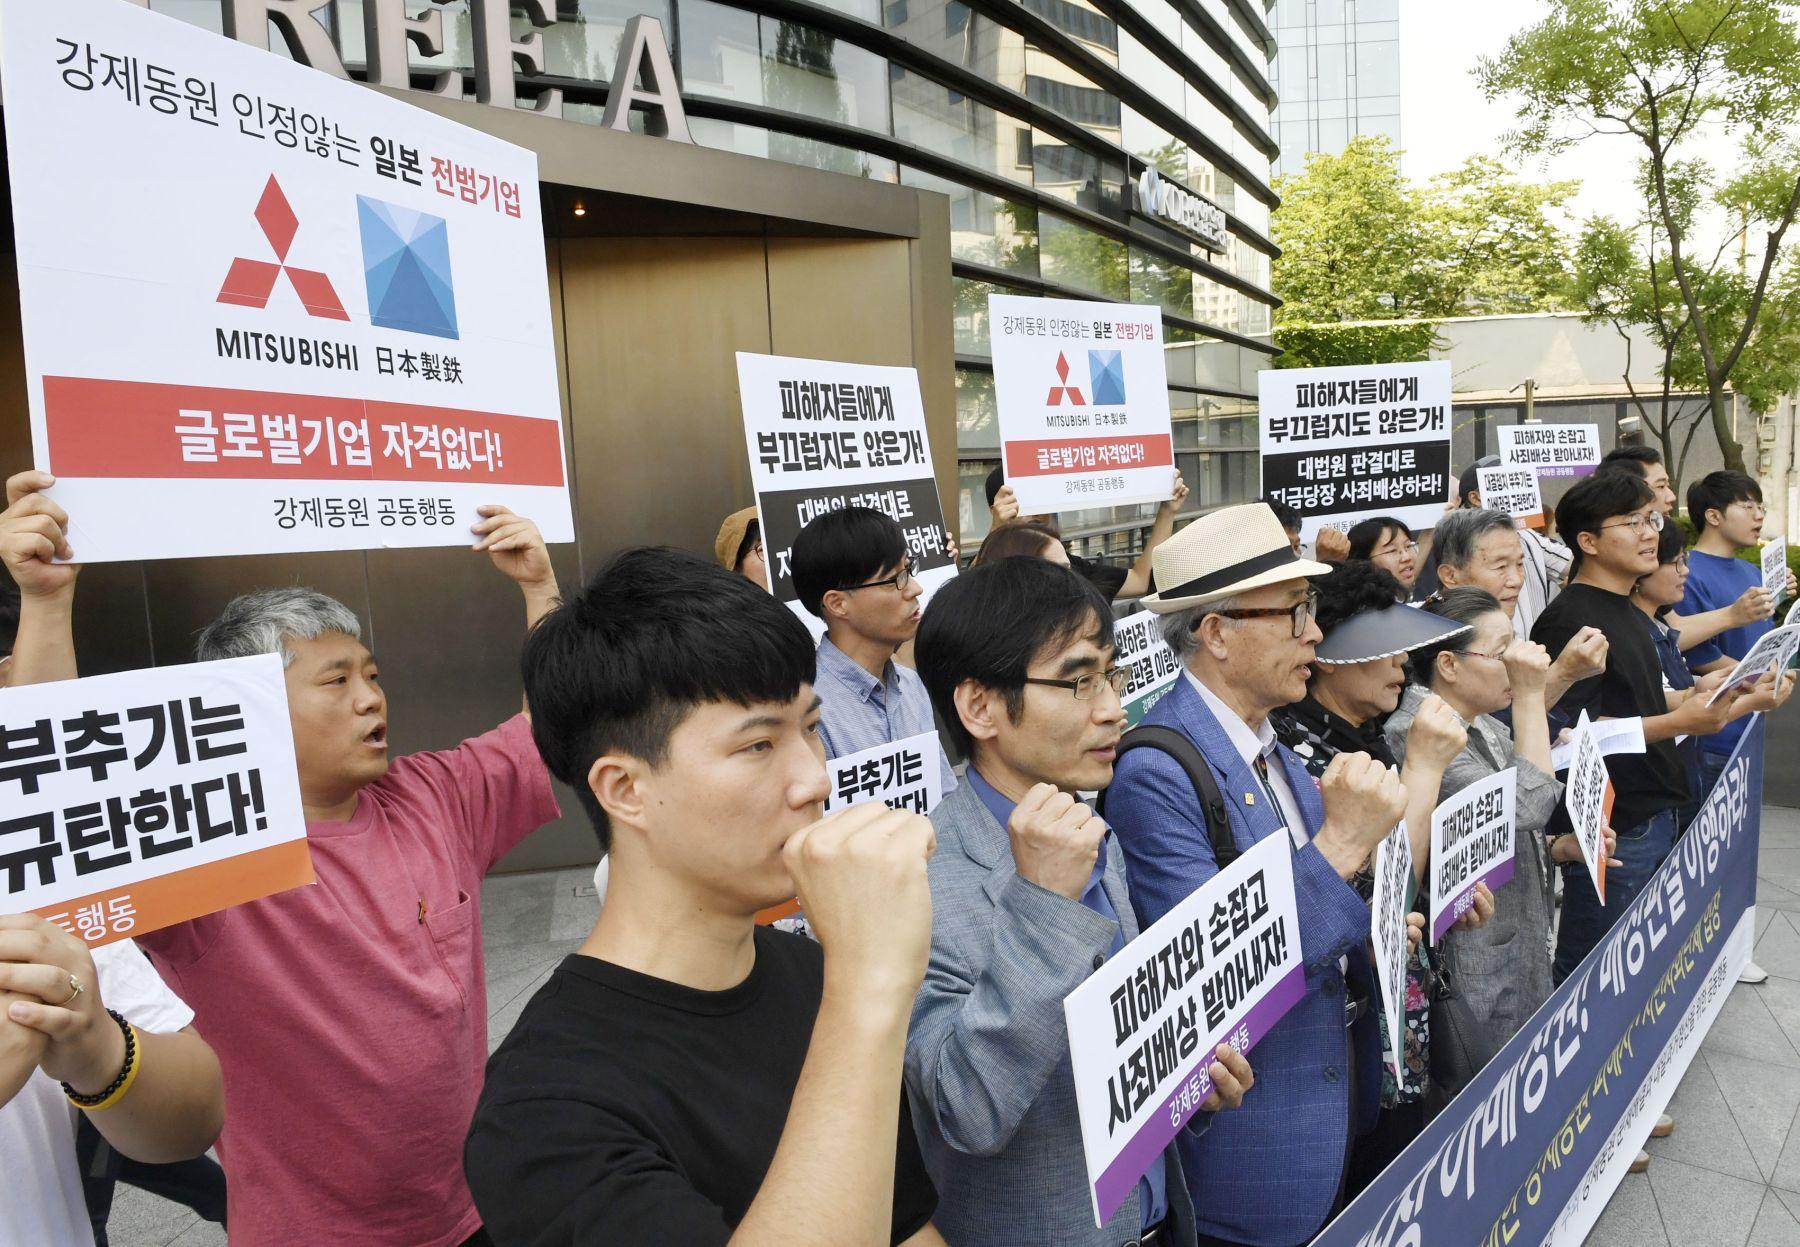 Japan S.Korea in Tension